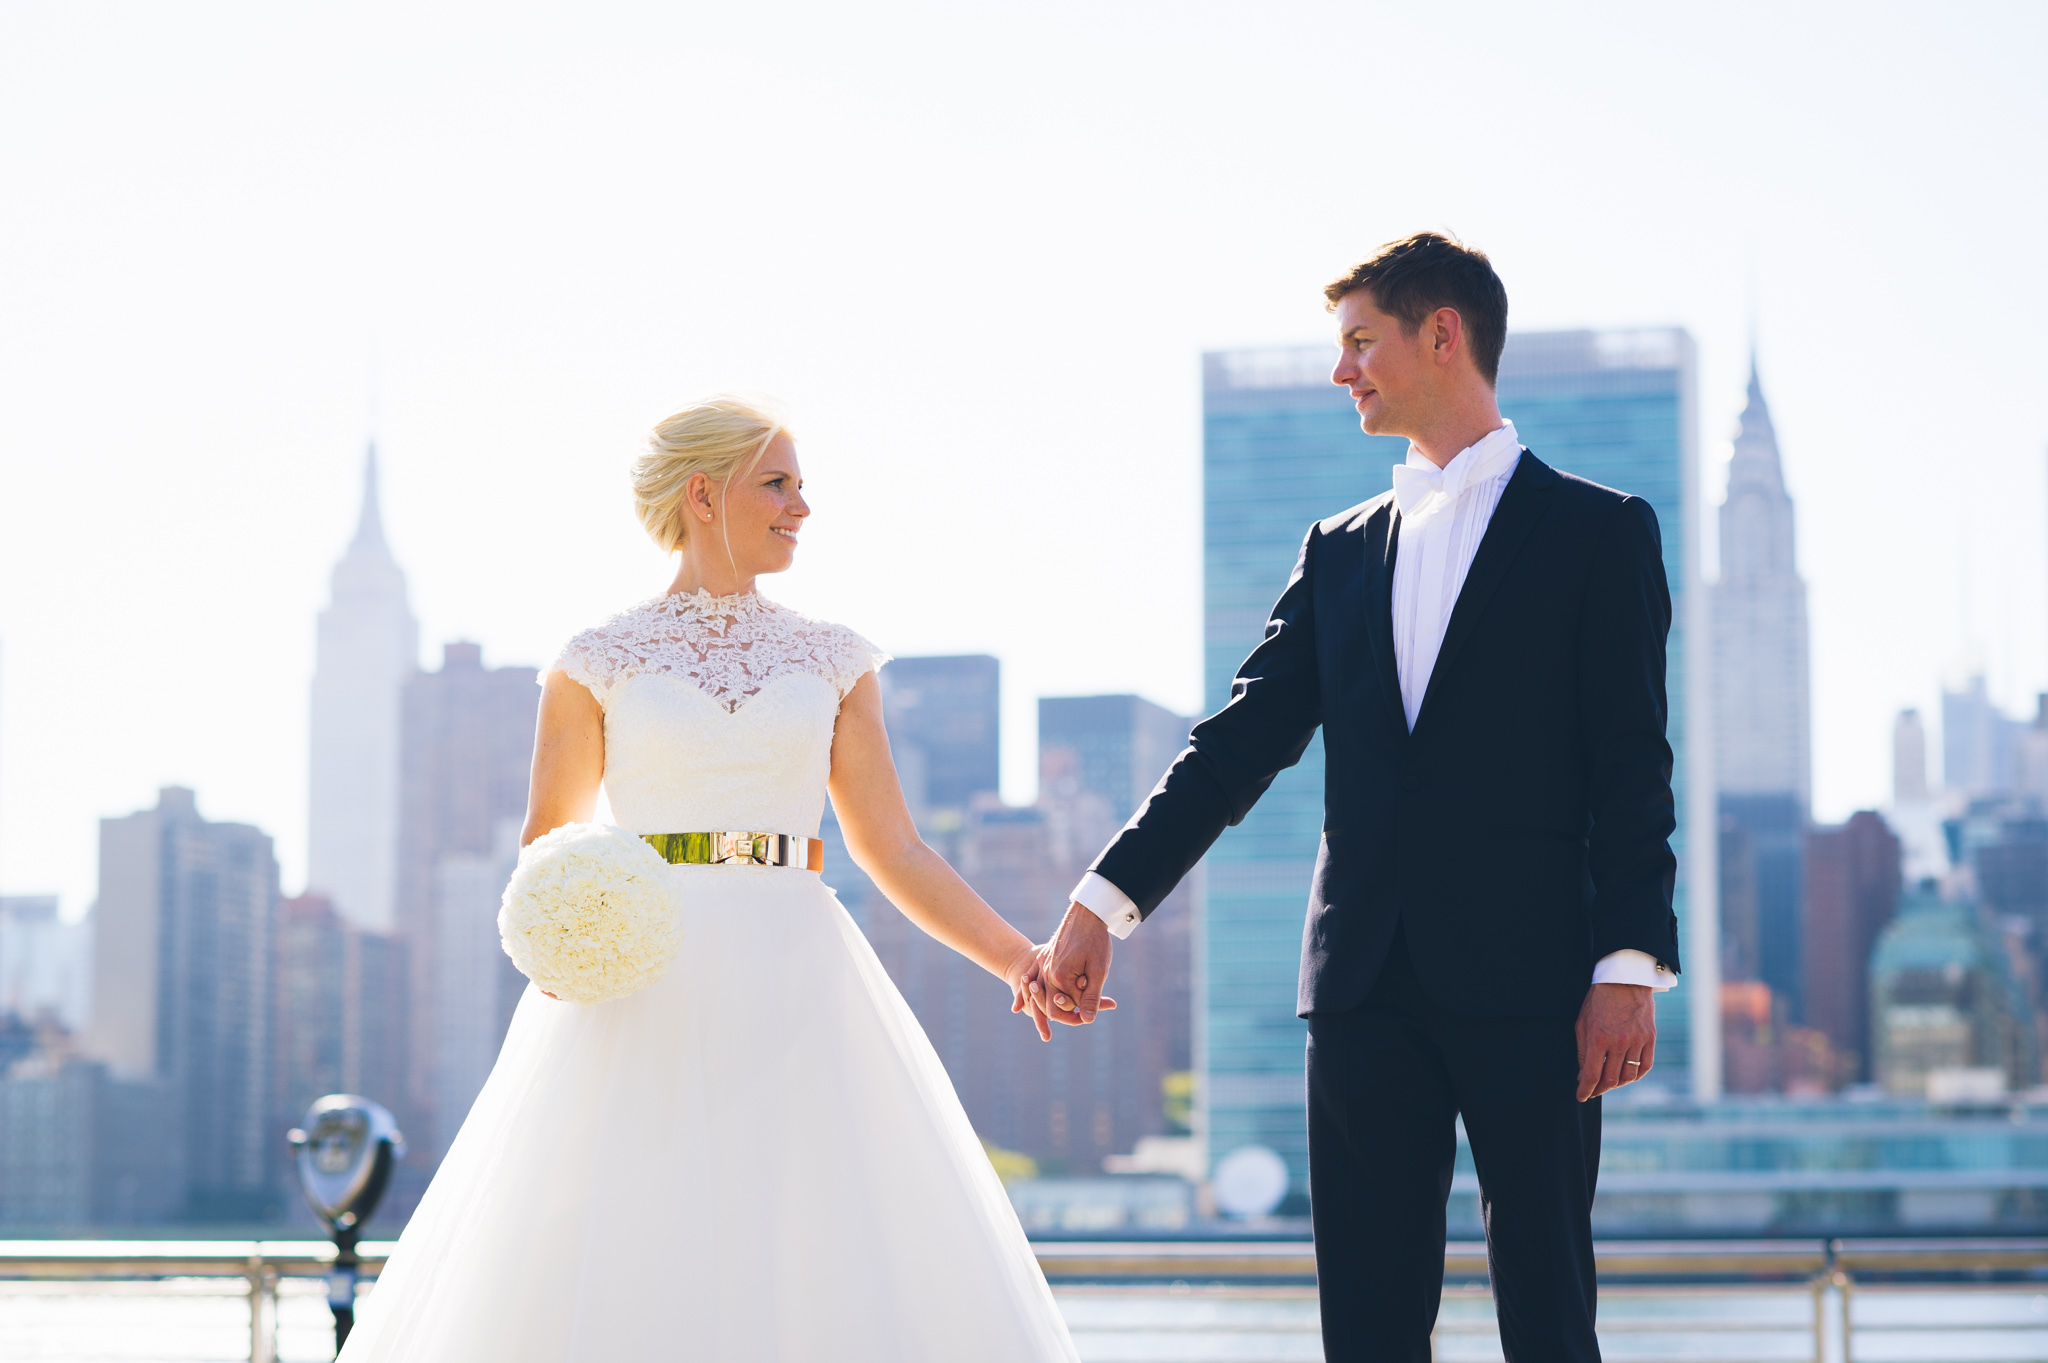 wedding wire - Elegant Manhattan Rooftop Wedding of Katharina & Ralf